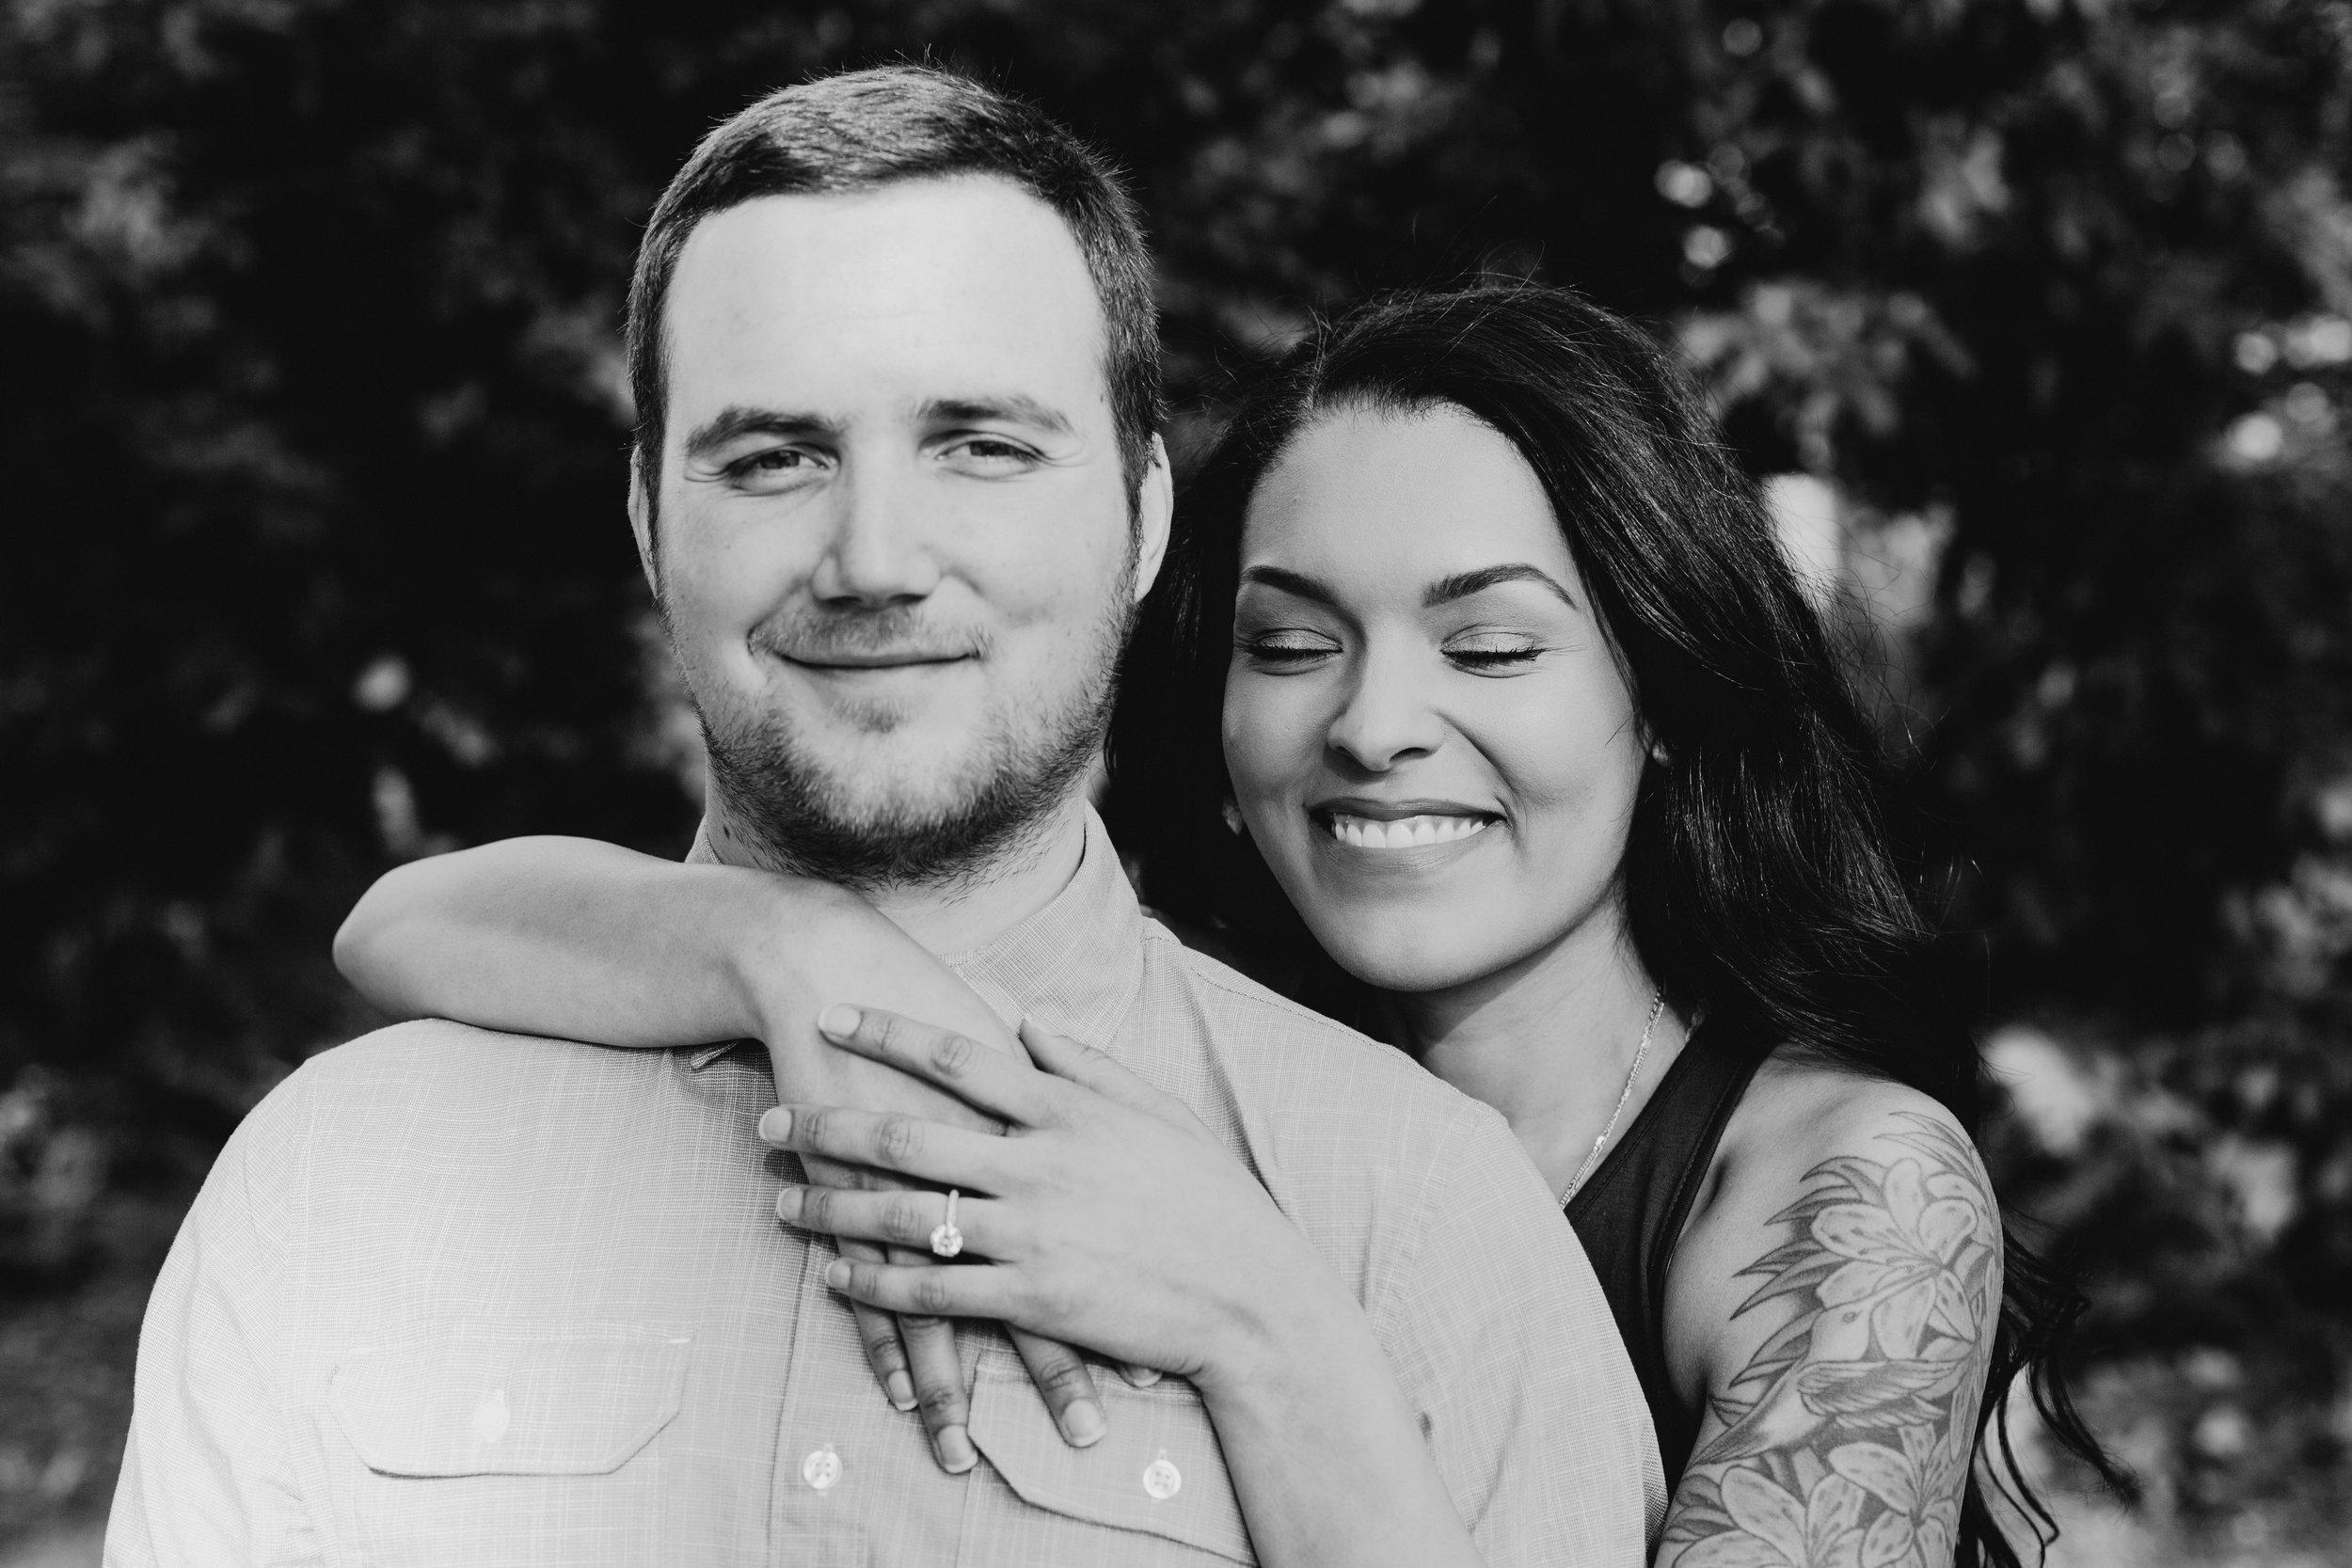 Rachel&Josh-Engaged-Favorites-5.jpg